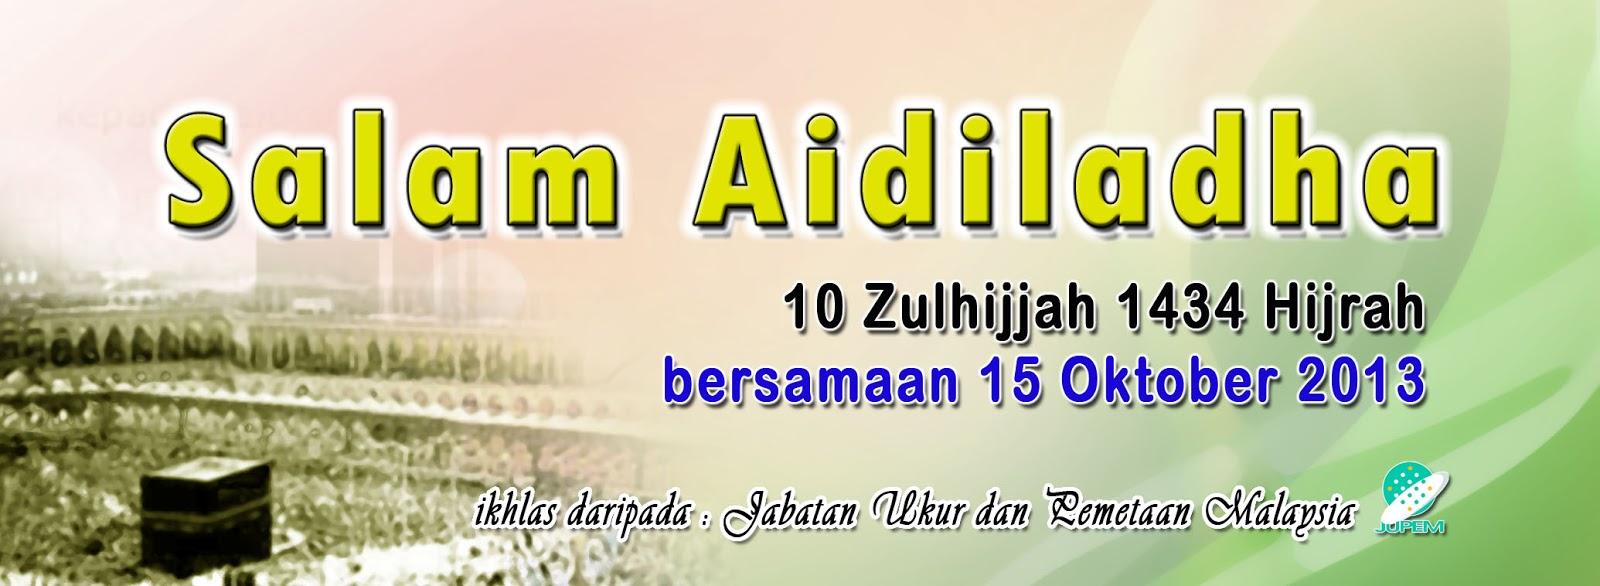 Salam aidiladha 2015 hd wallpapers images free download online salam aidiladha hd wallpapers images free download 6 kristyandbryce Images